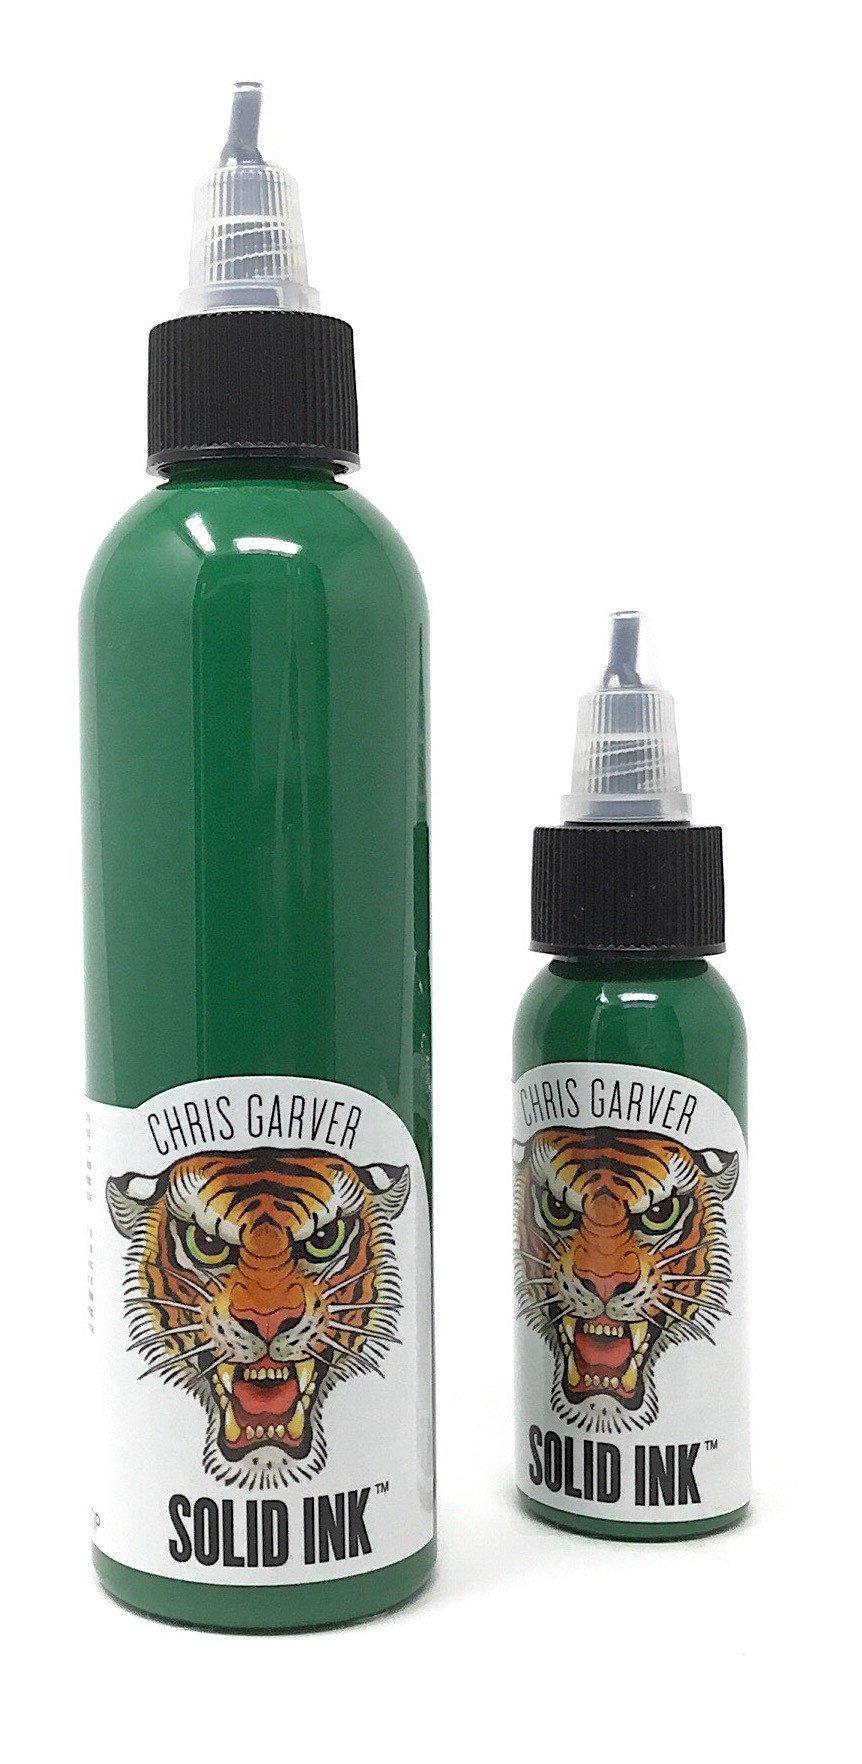 Green Tip - Chris Garver - Solid Ink - Federico Ferroni